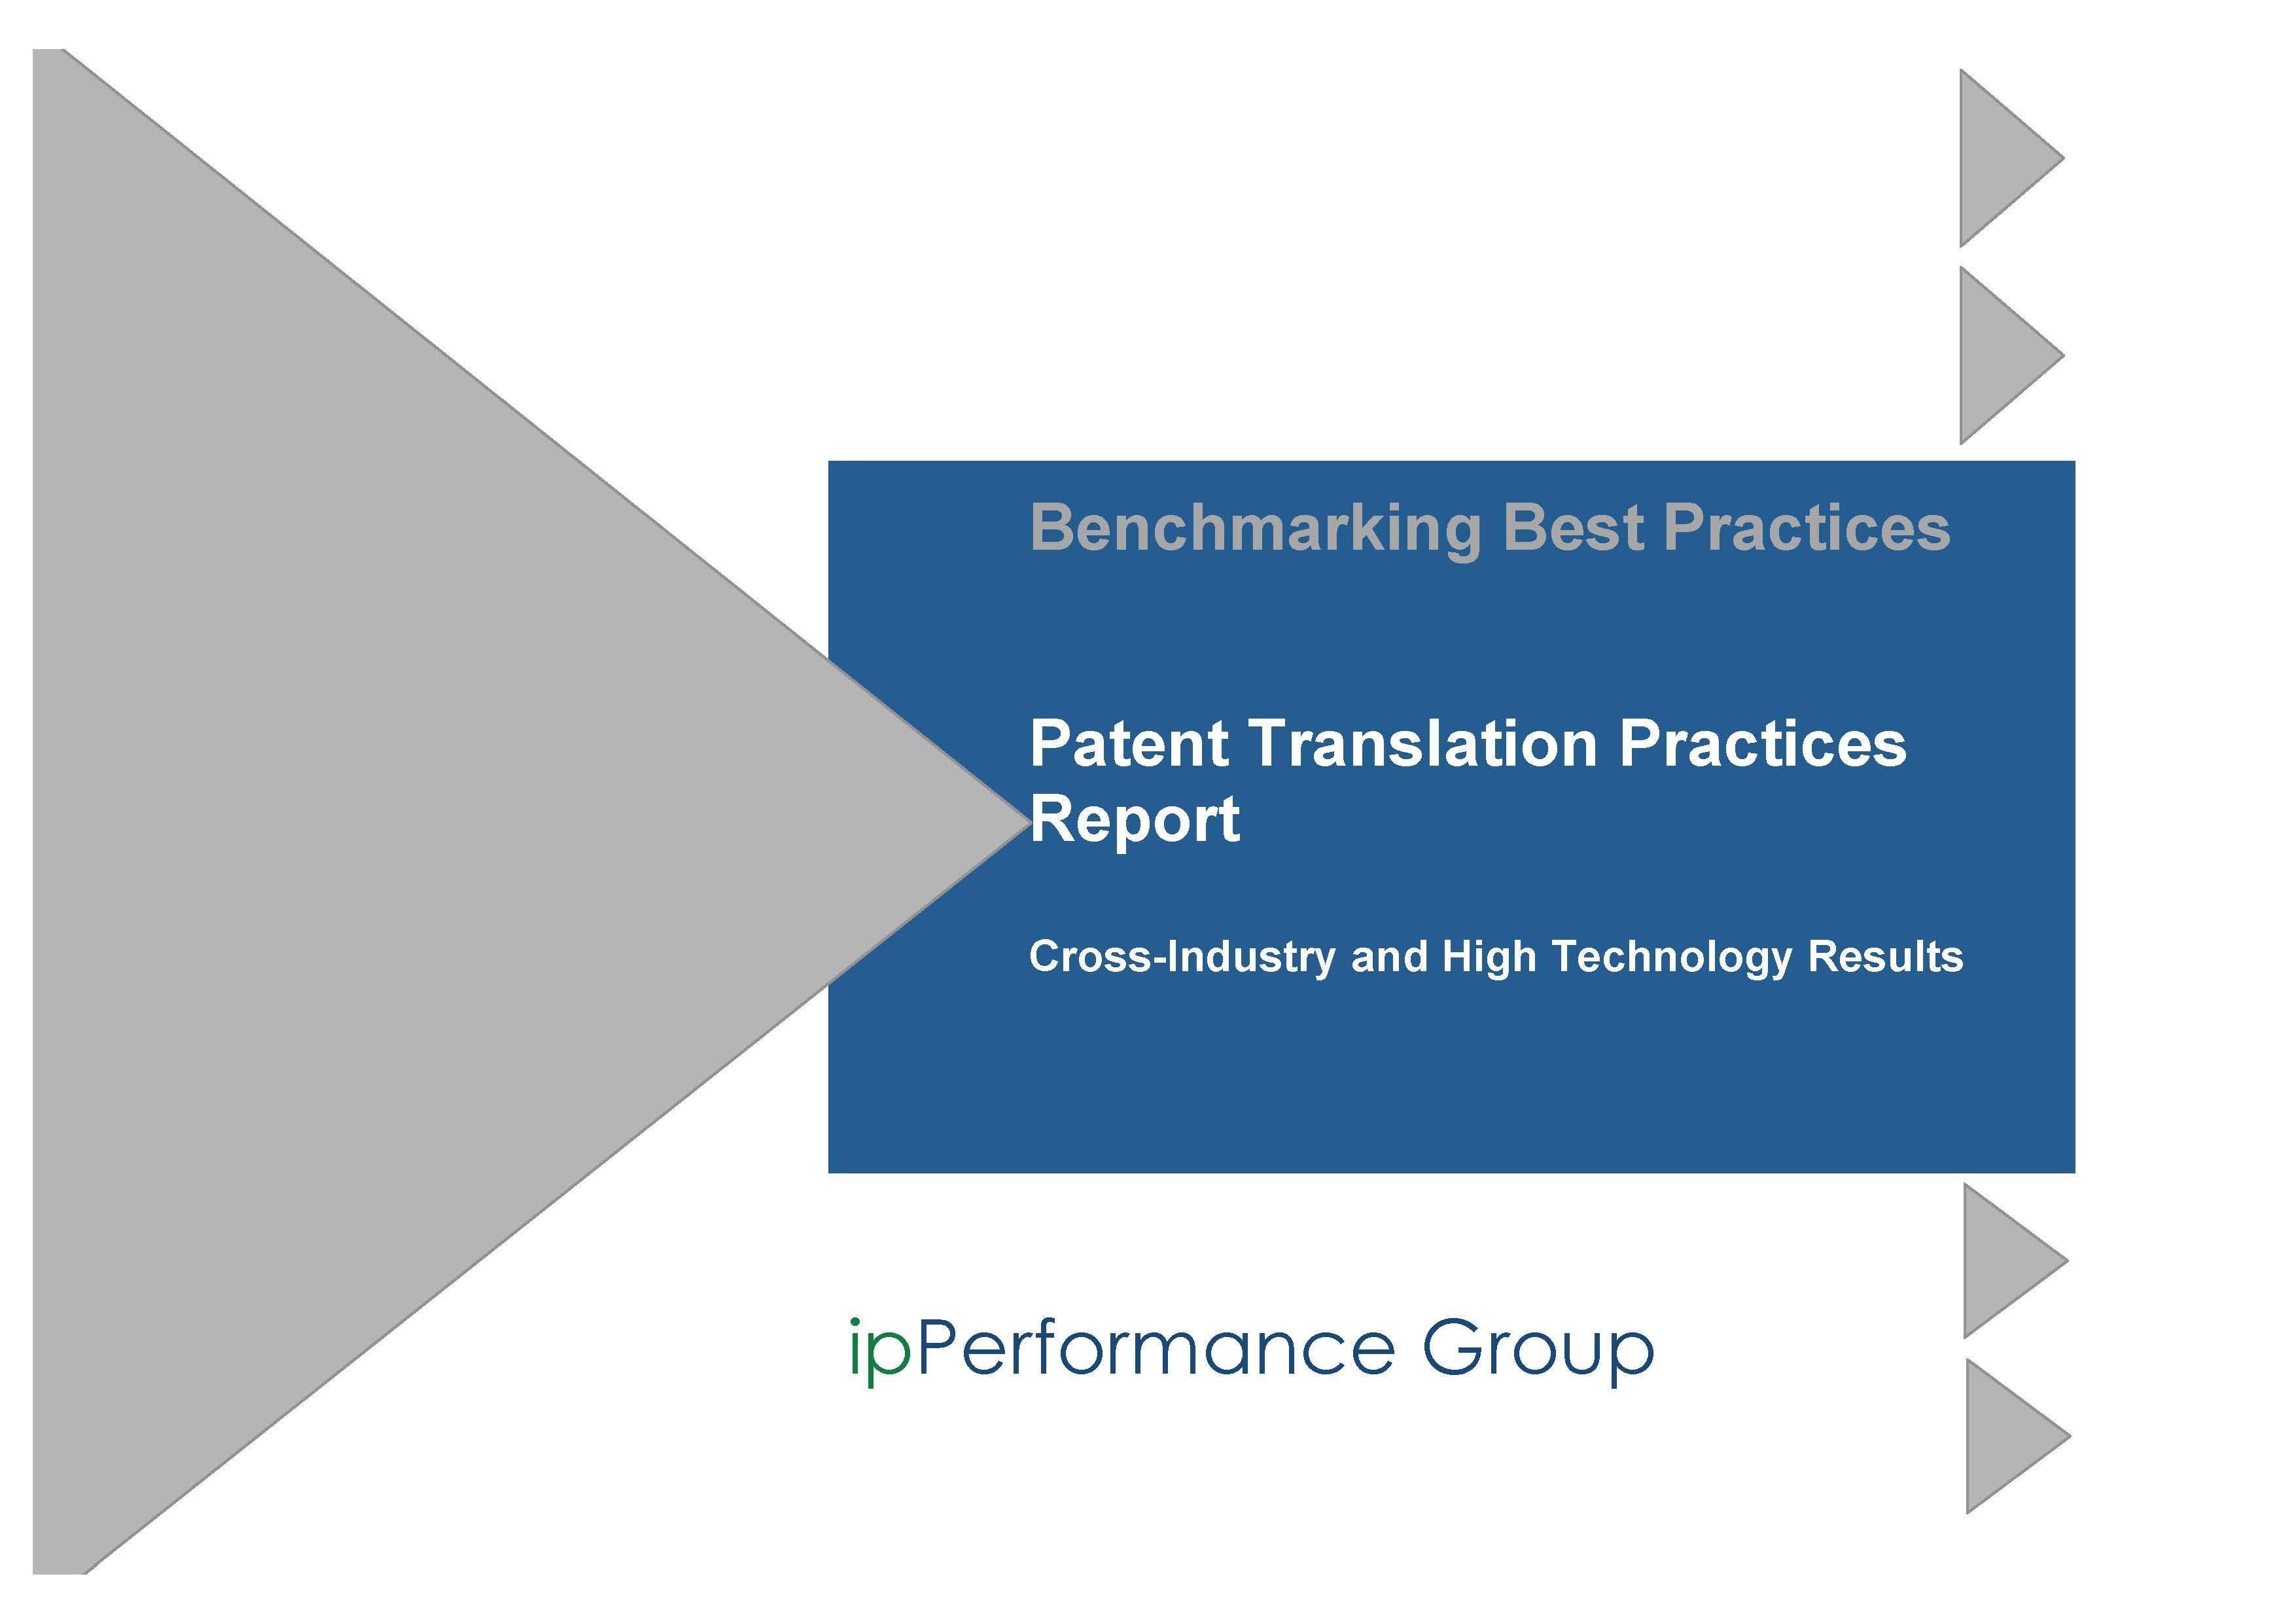 Patent Translation Practices